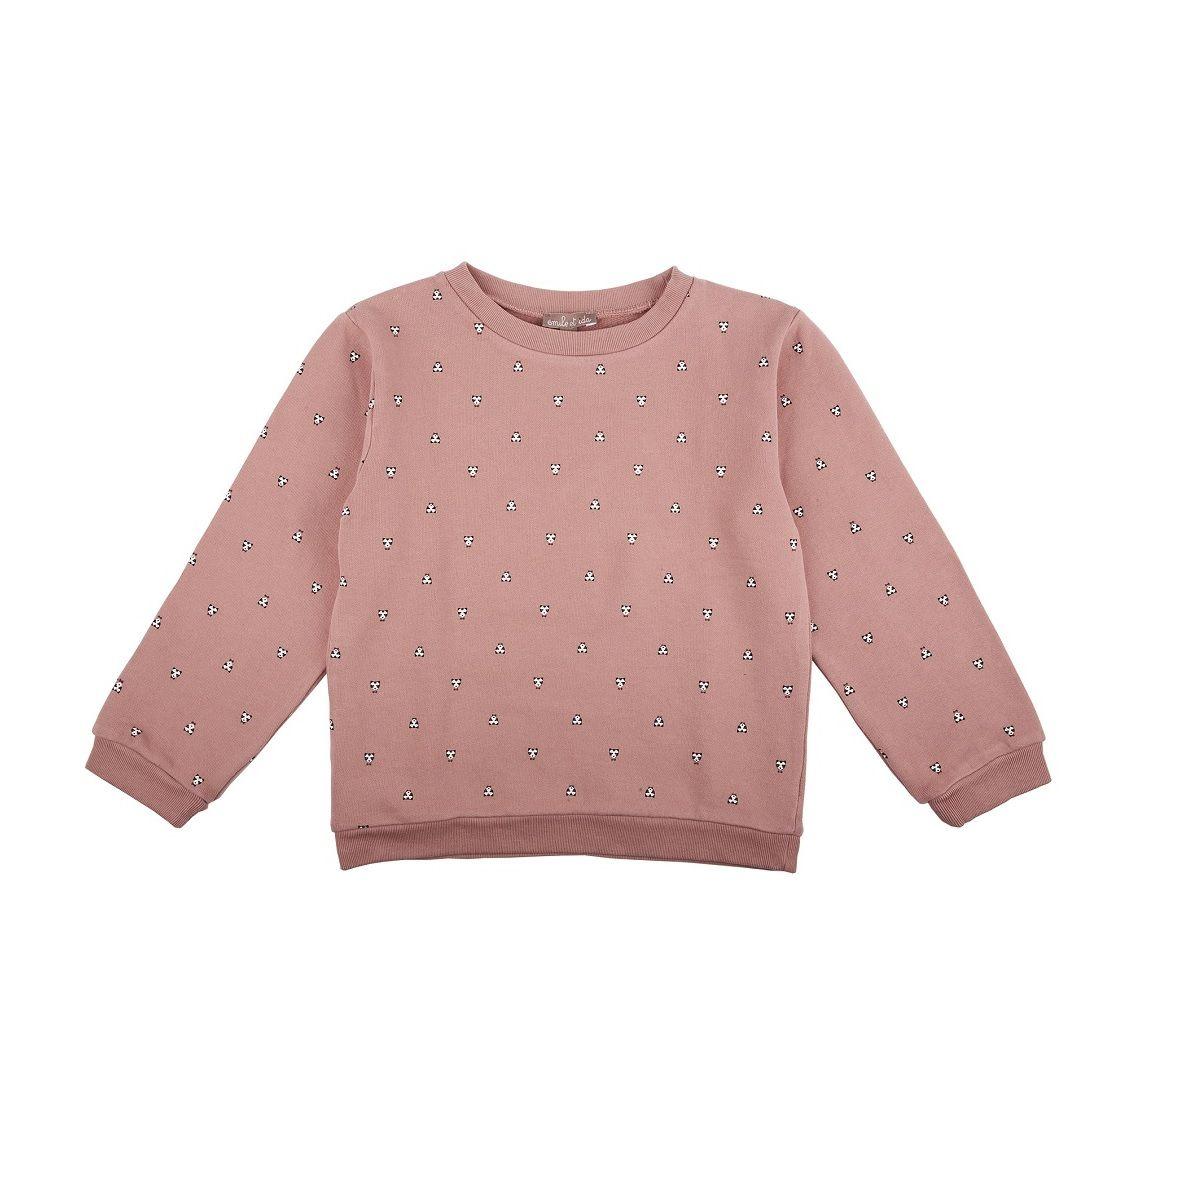 Emile et Ida Blush All Over Ours Sweatshirt | www.littlesahou.com